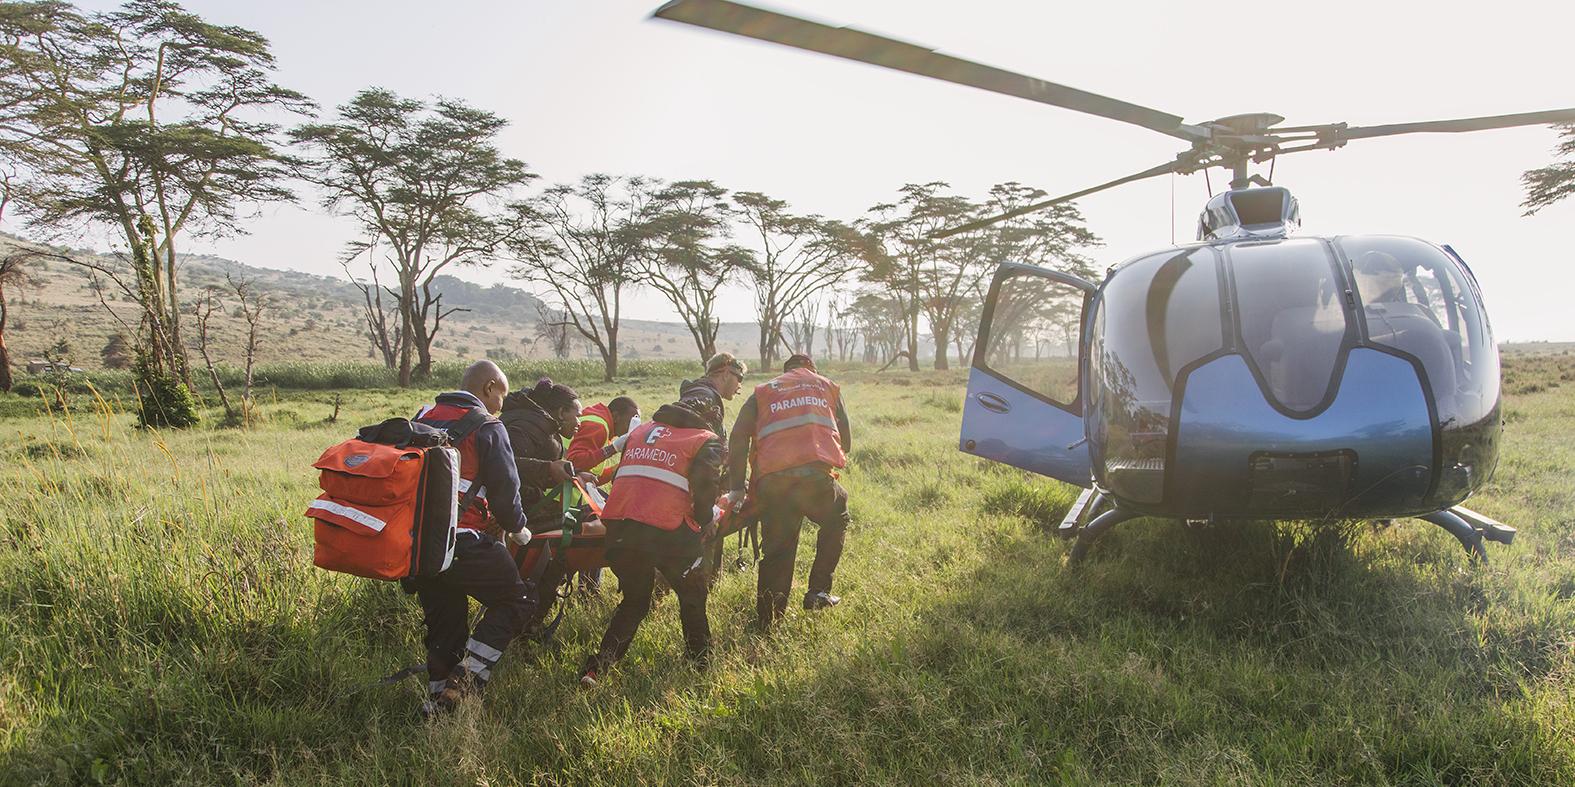 Medevac at Lewa Safaricom Marathon, helicopter support